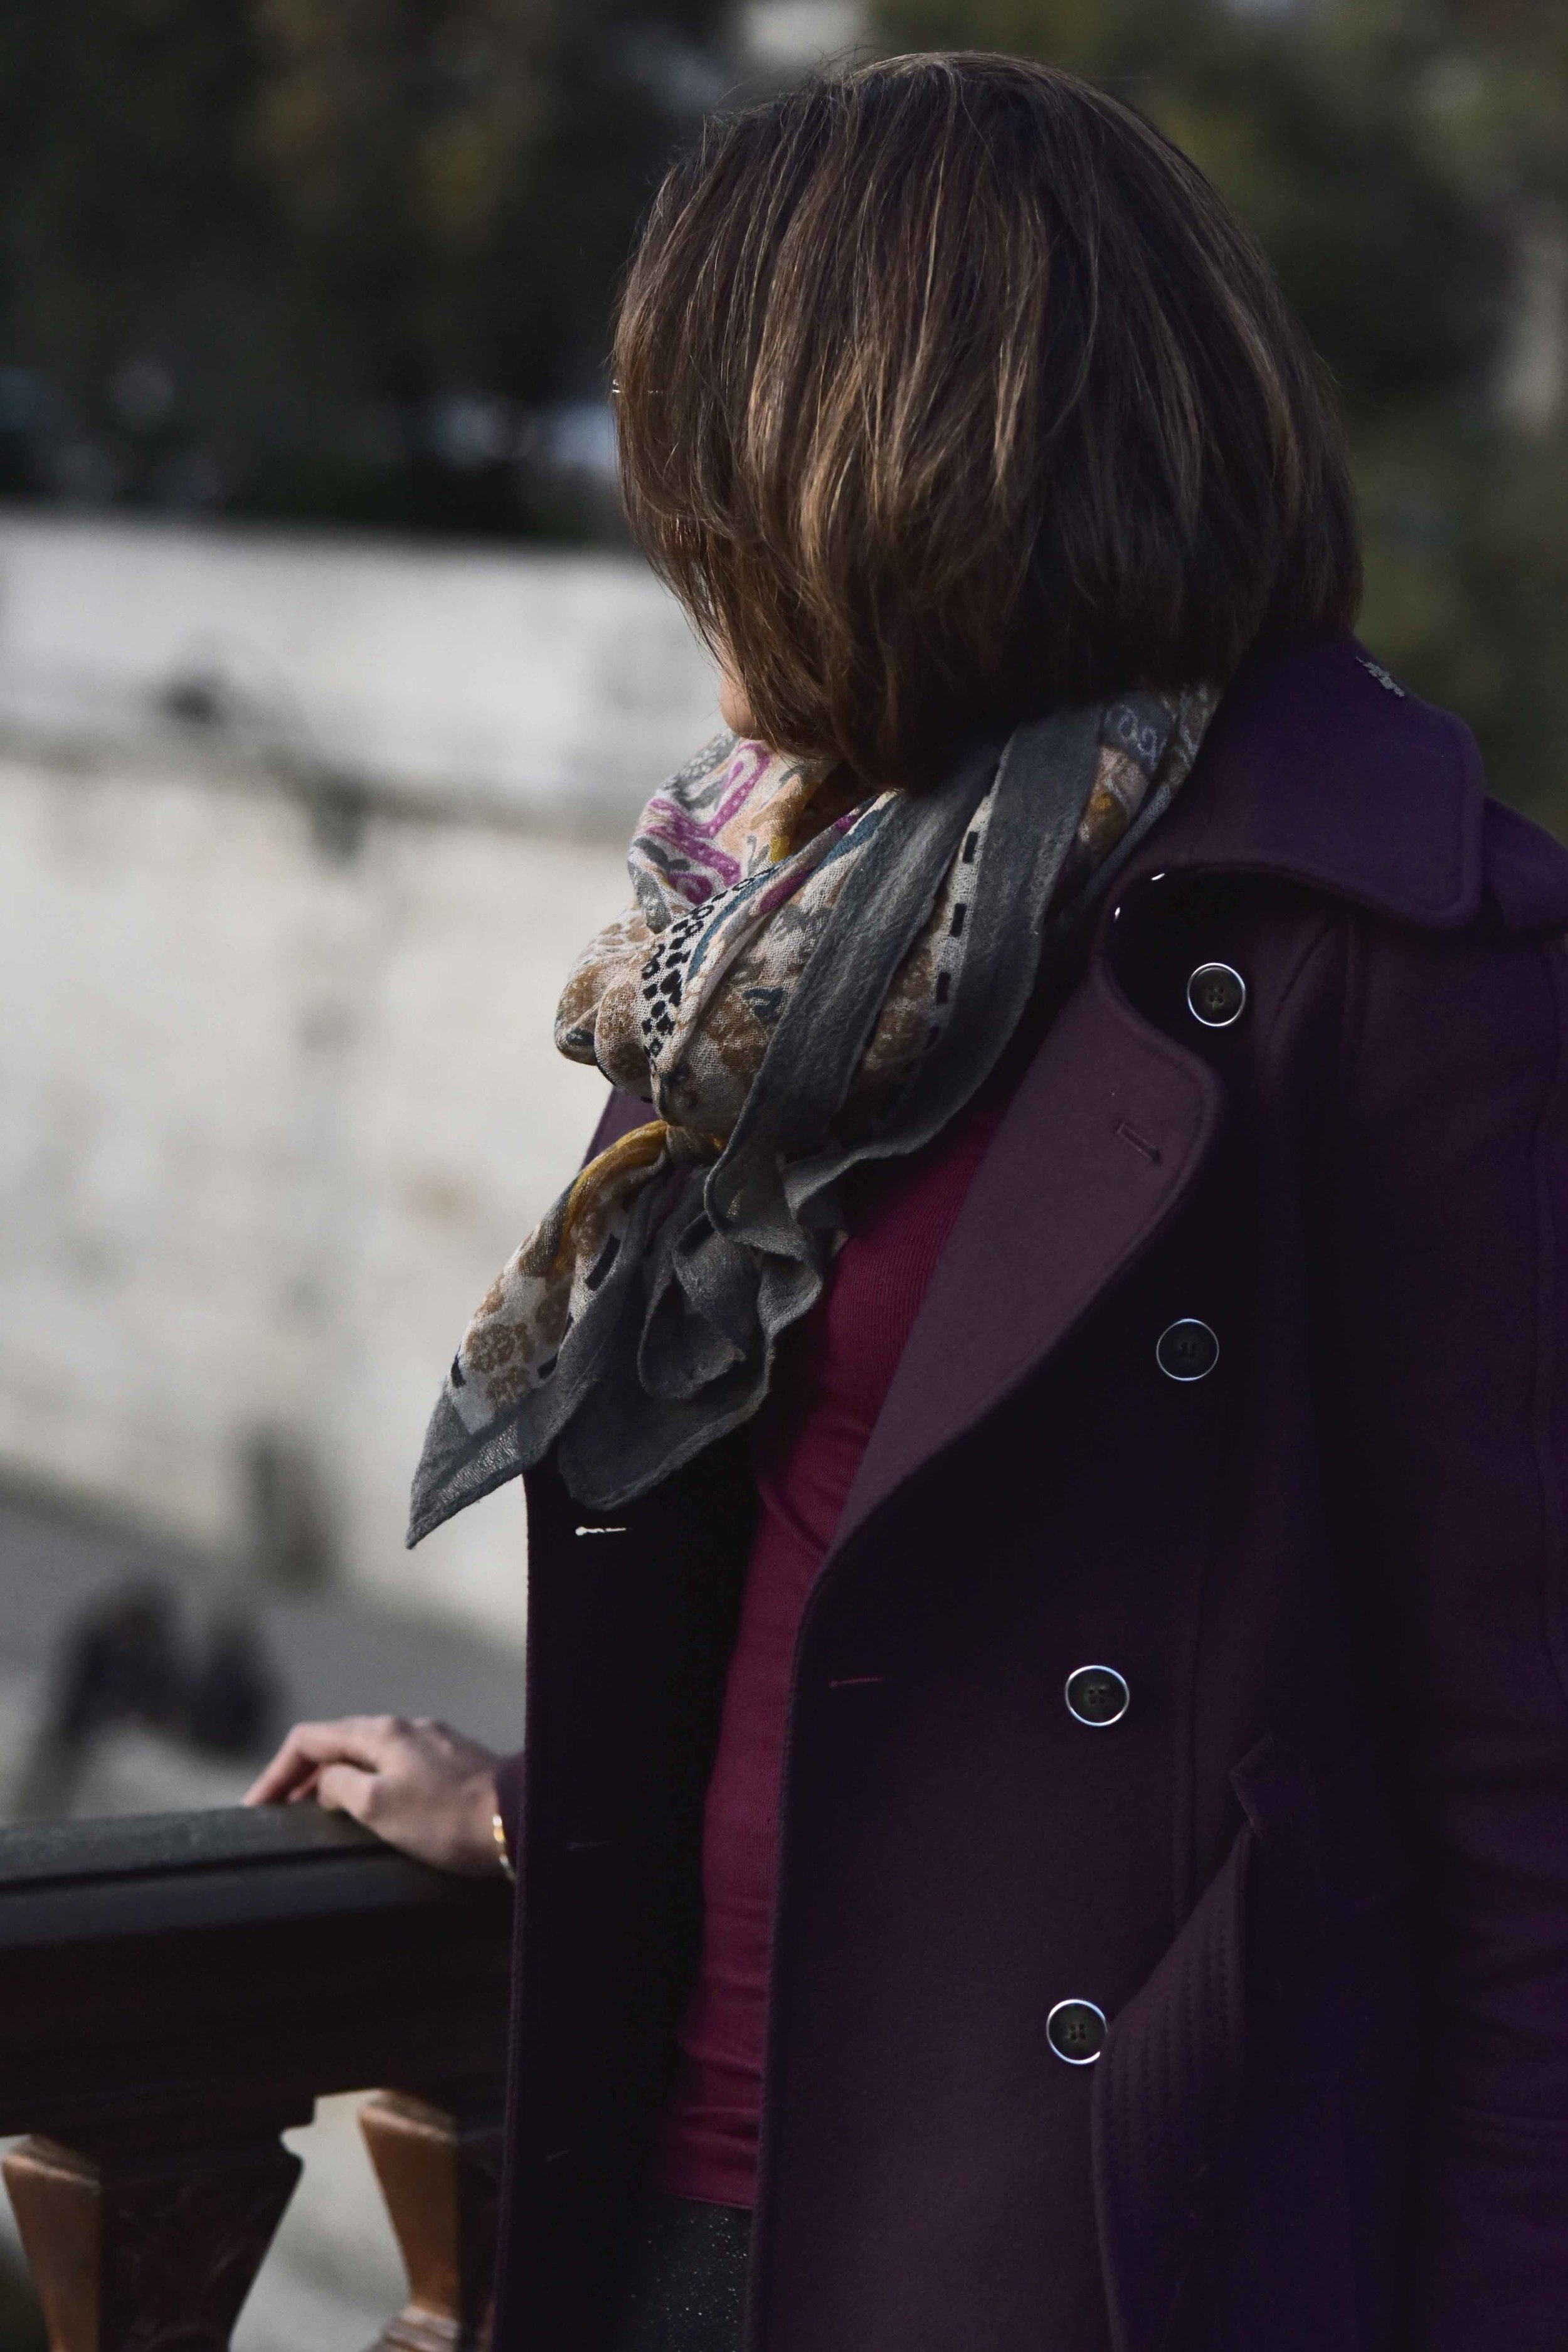 Karen Millen fall winter coat, Ralph Lauren polo neck sweater, Hallhuber scarf, Notre-Dame, Paris. Image©sourcingstyle.com